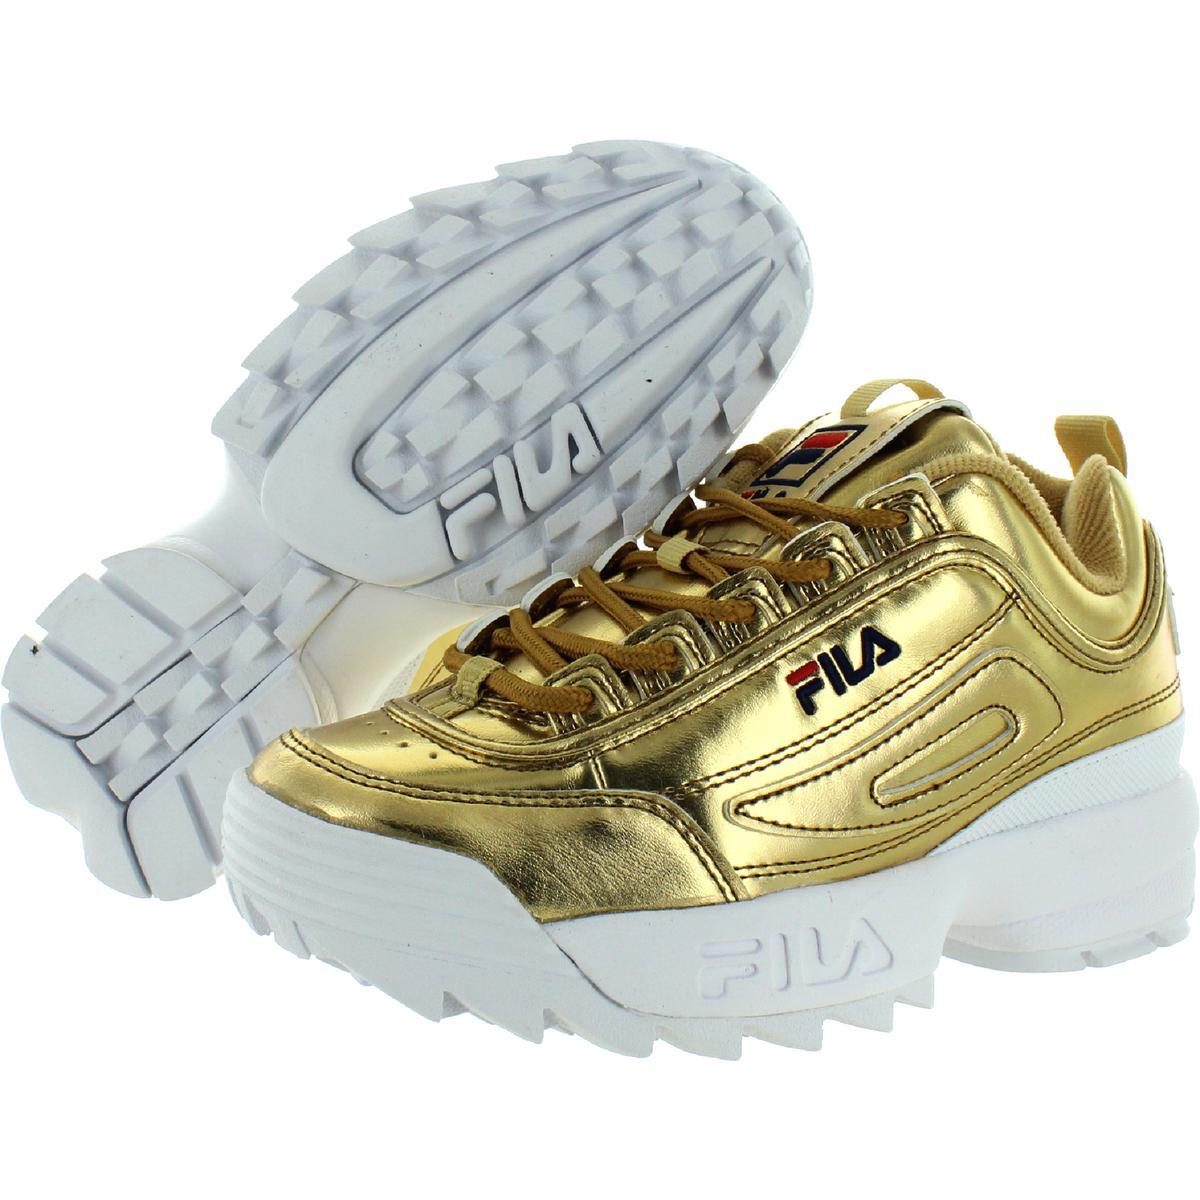 Fila-Womens-Disruptor-II-Premium-Metallic-Trainers-Sneakers-Shoes-BHFO-5237 thumbnail 5